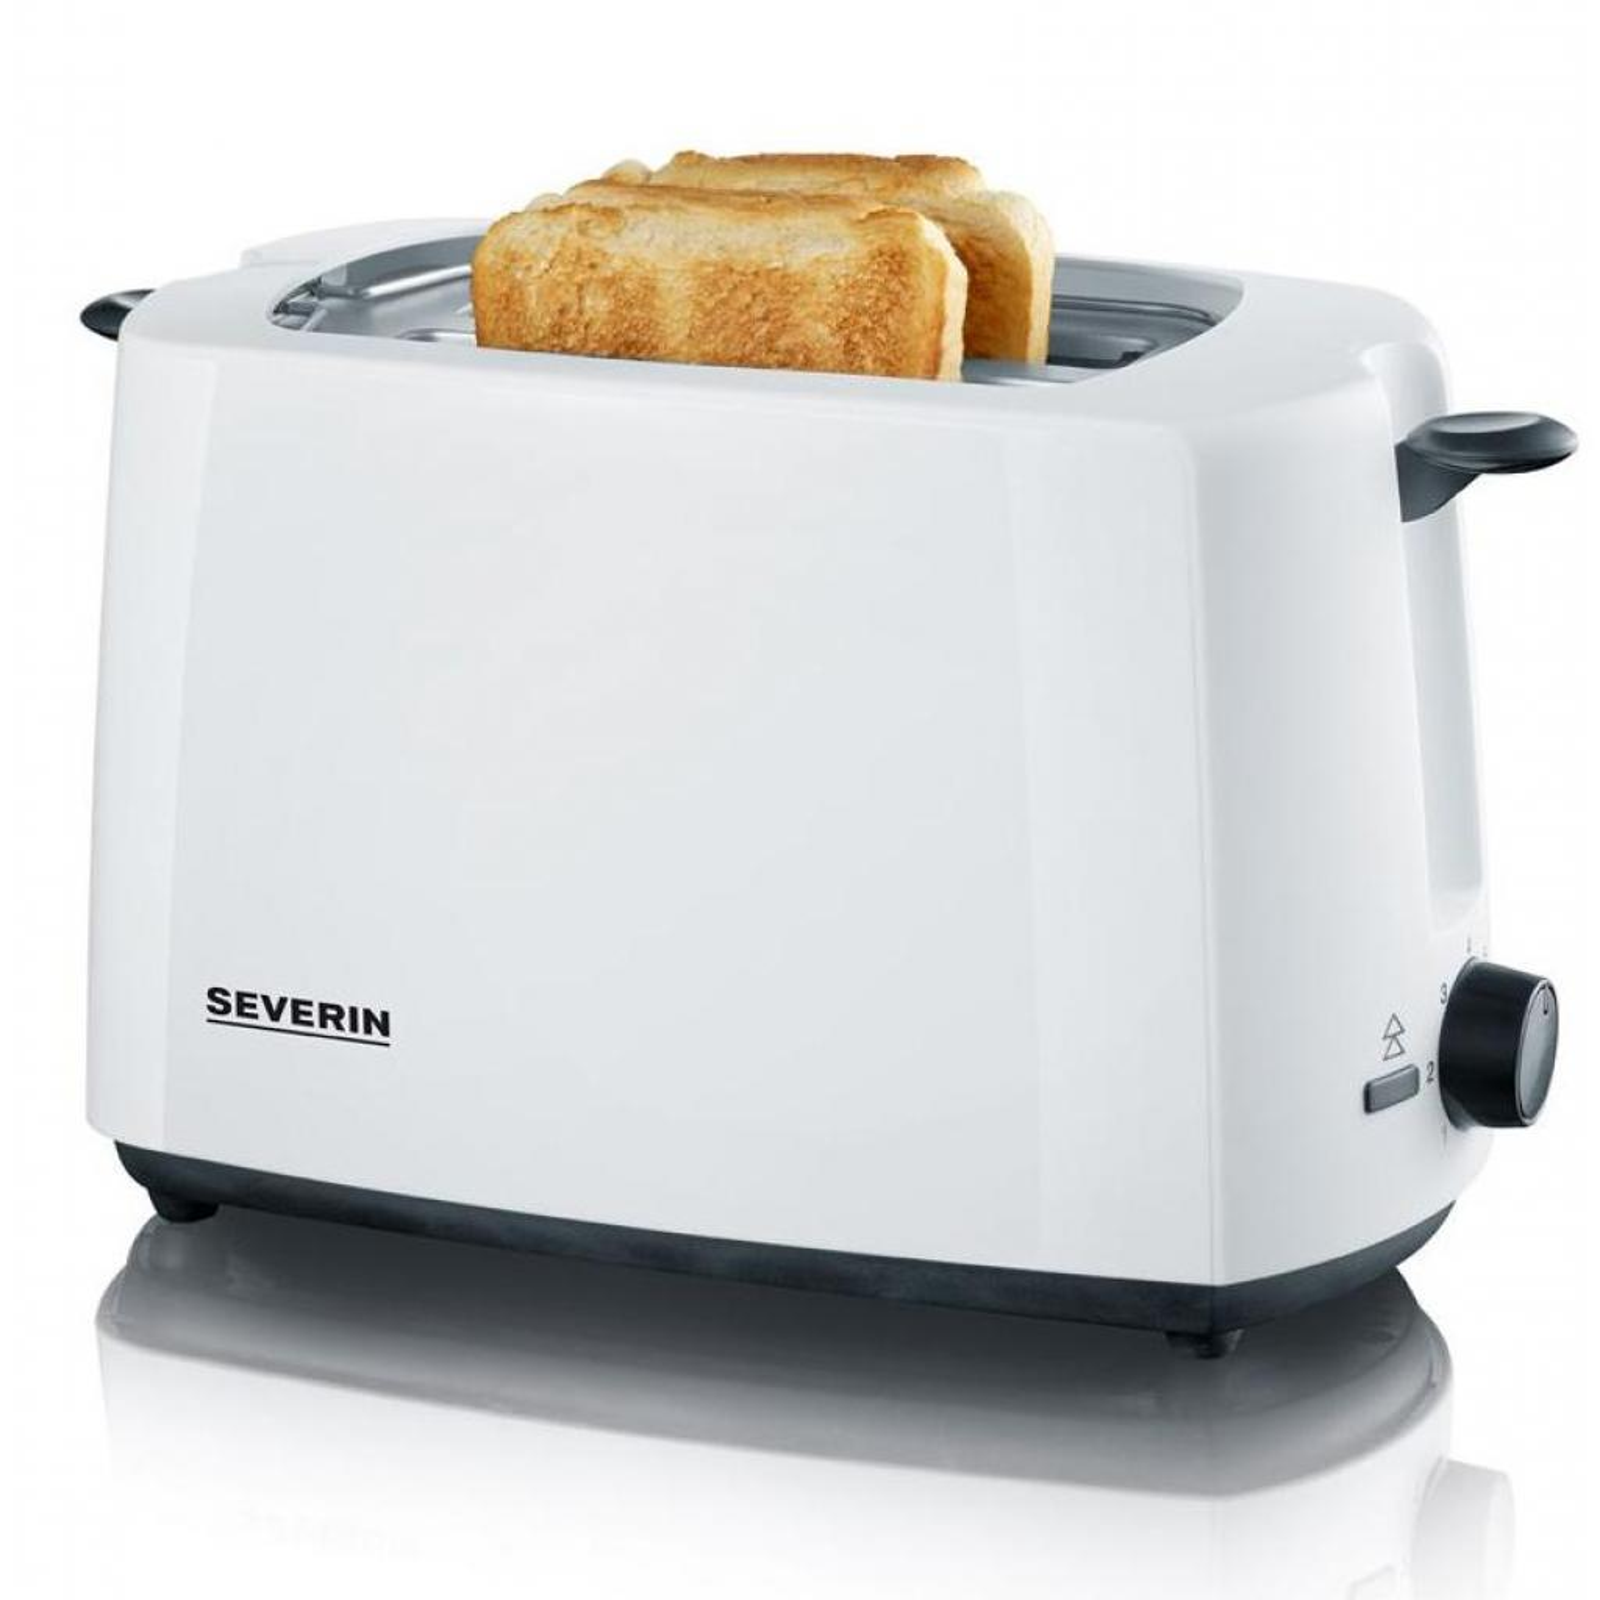 Тостер SEVERIN AT 2286 white изображение 4